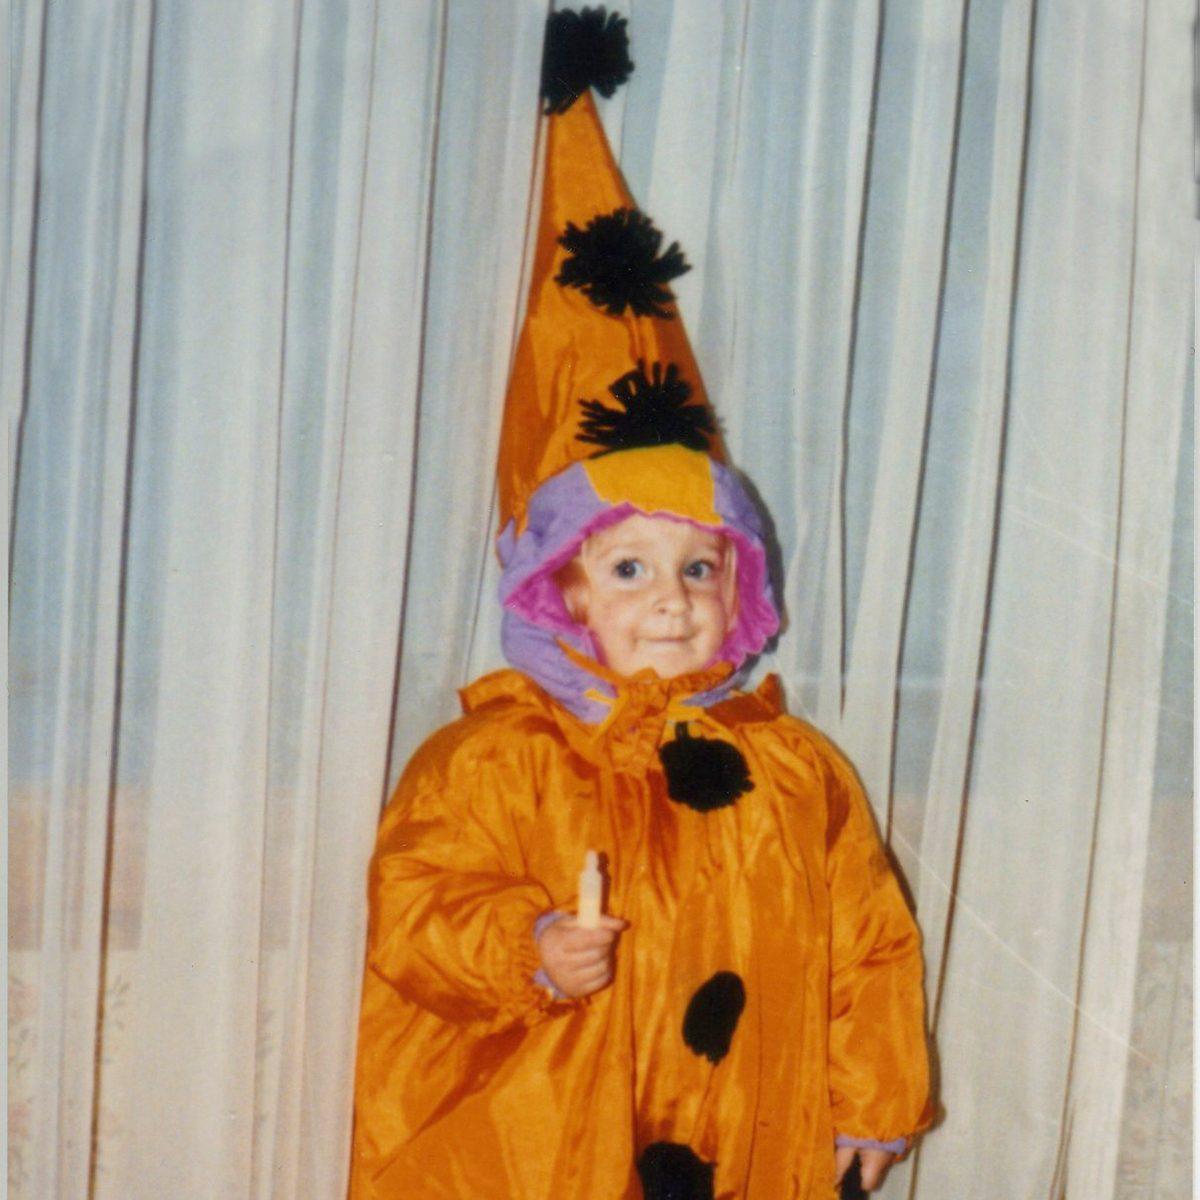 child dressed in Halloween costume